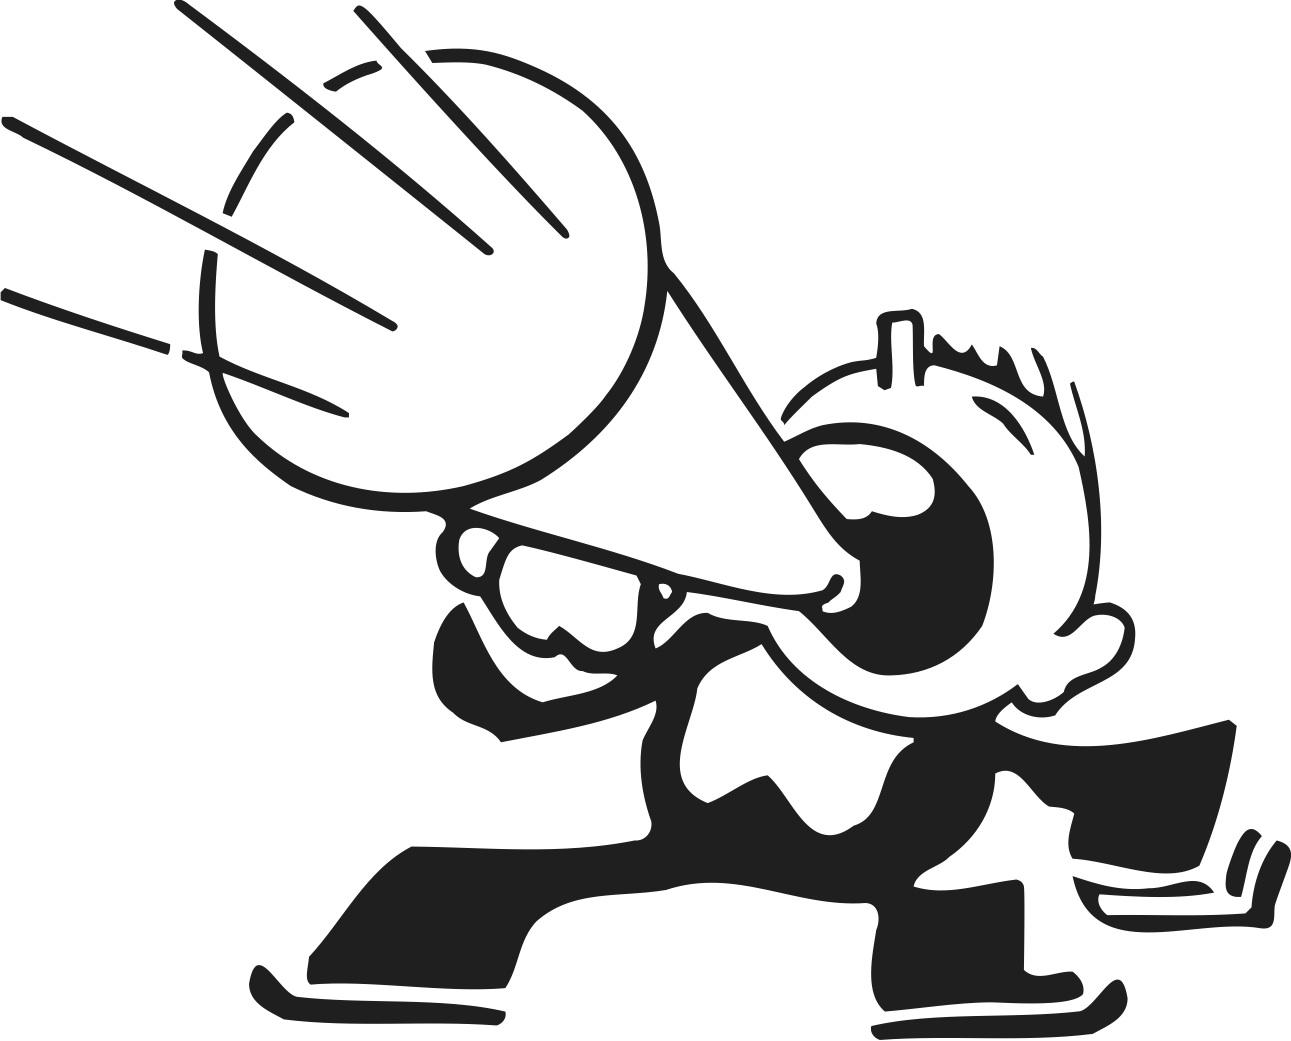 Clipart megaphone tumundografico 3.